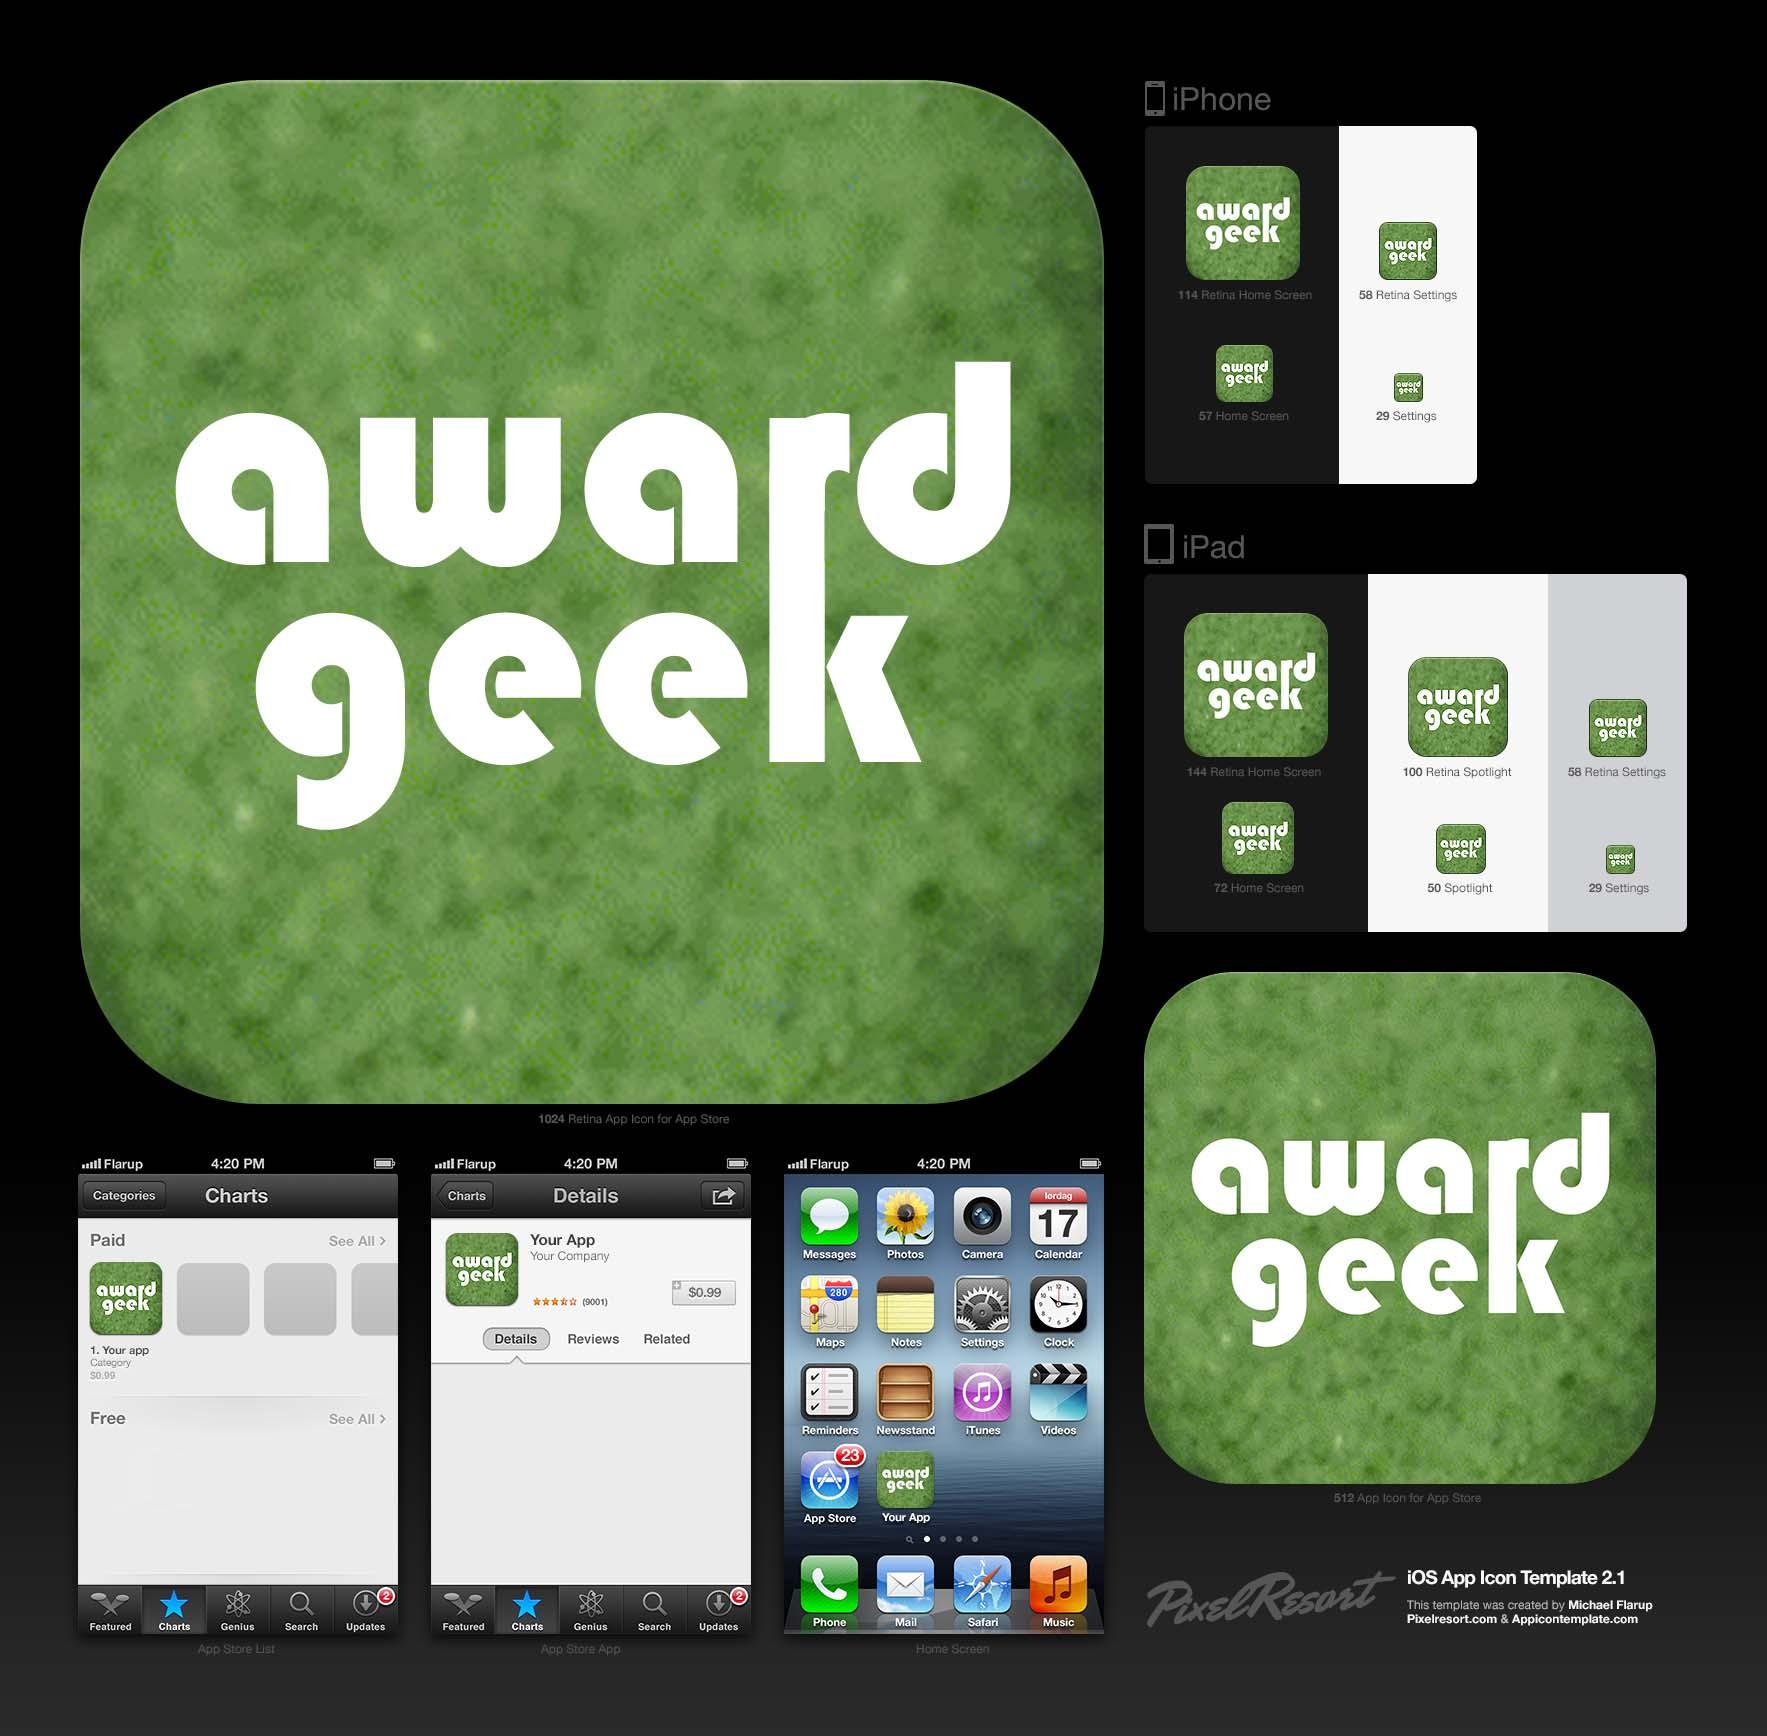 Award Geek: Tennis - image 5 - student project